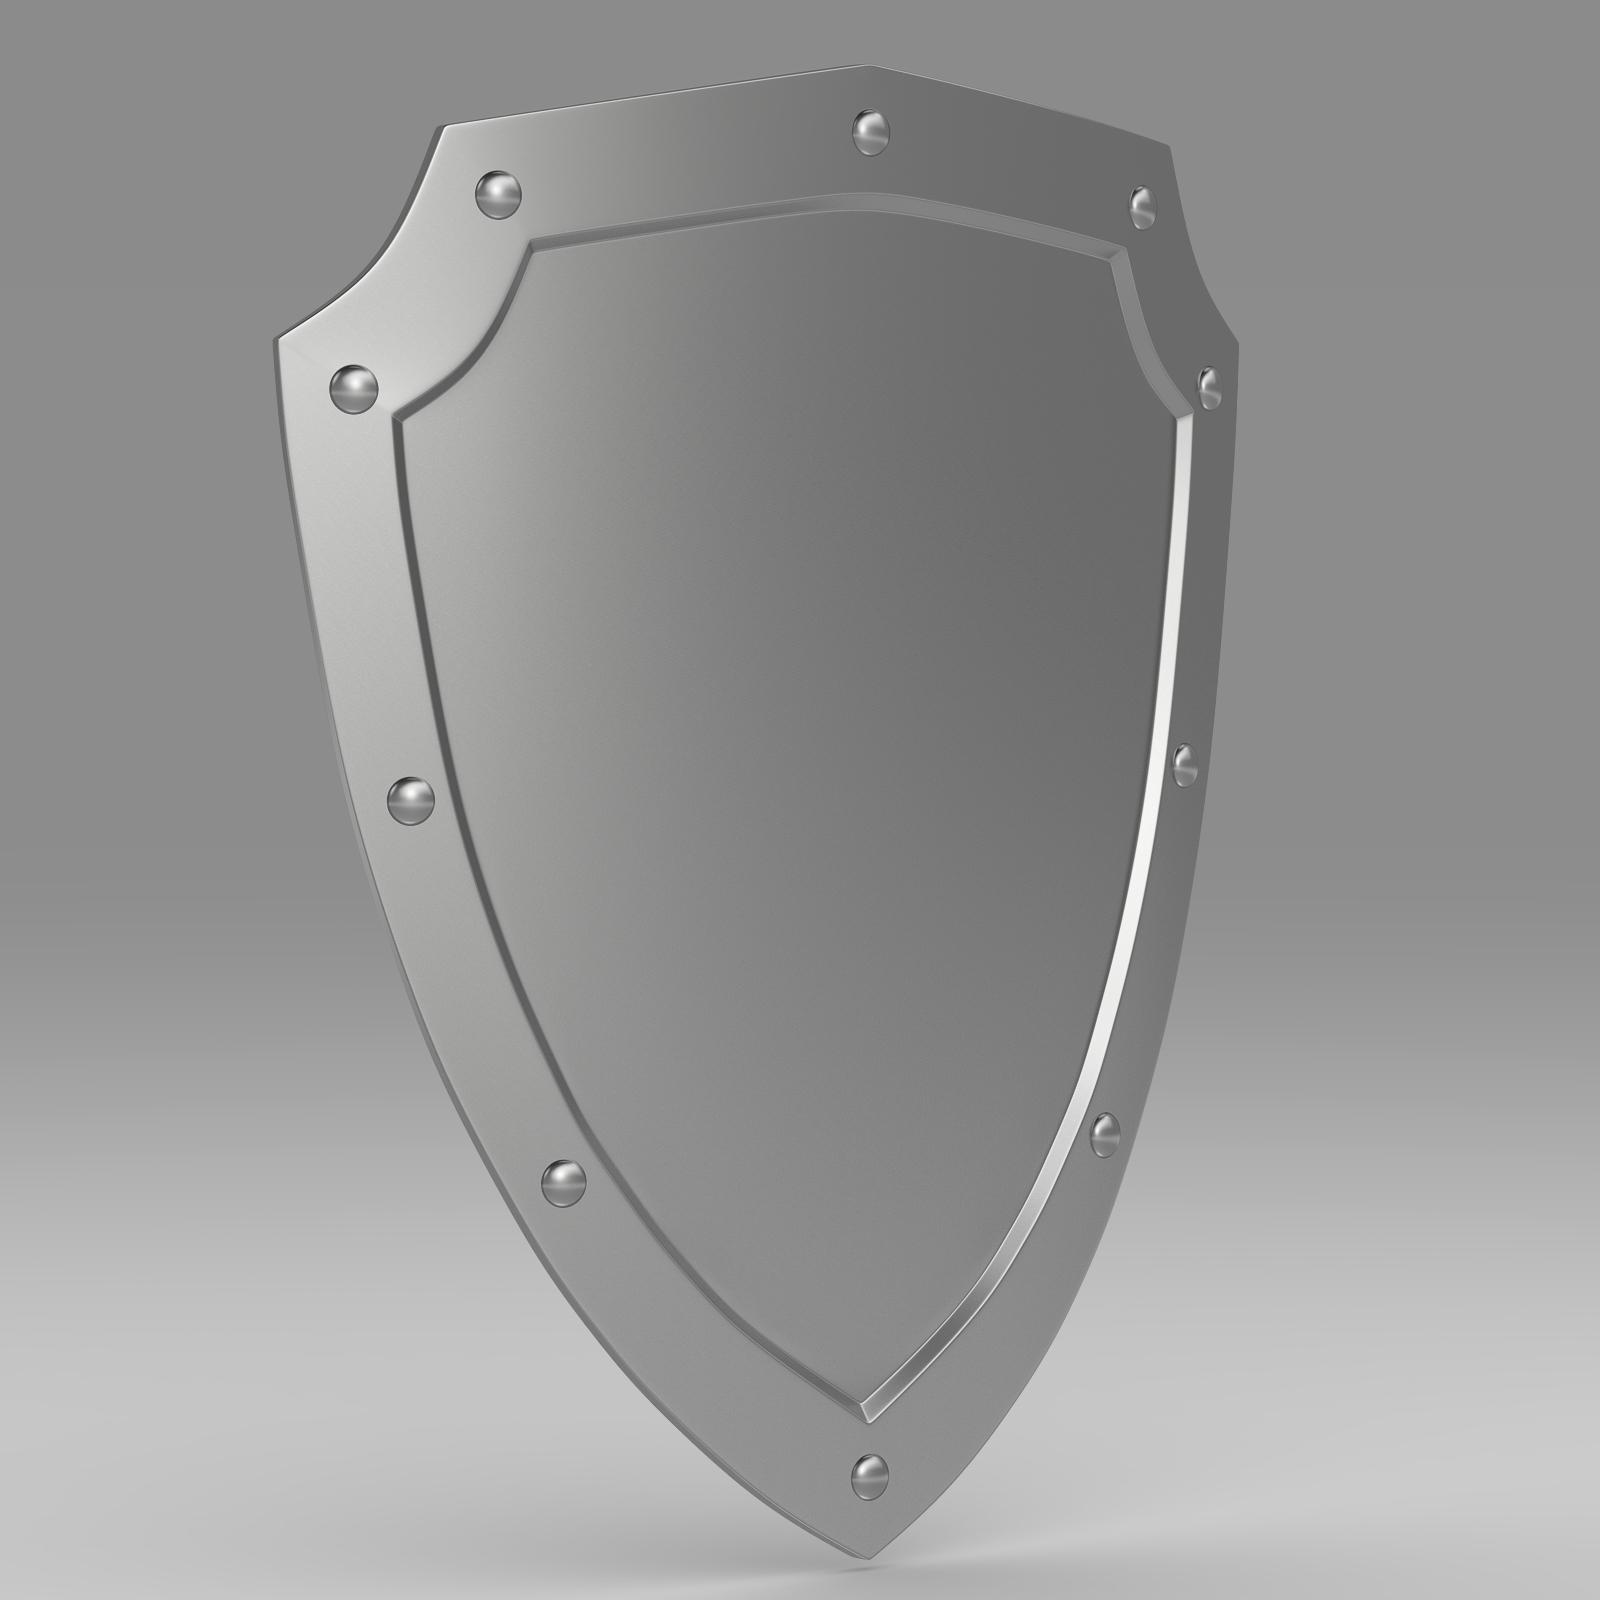 Medieval Shield 3d model 3ds fbx c4d lwo lws lw ma mb   obj 223655